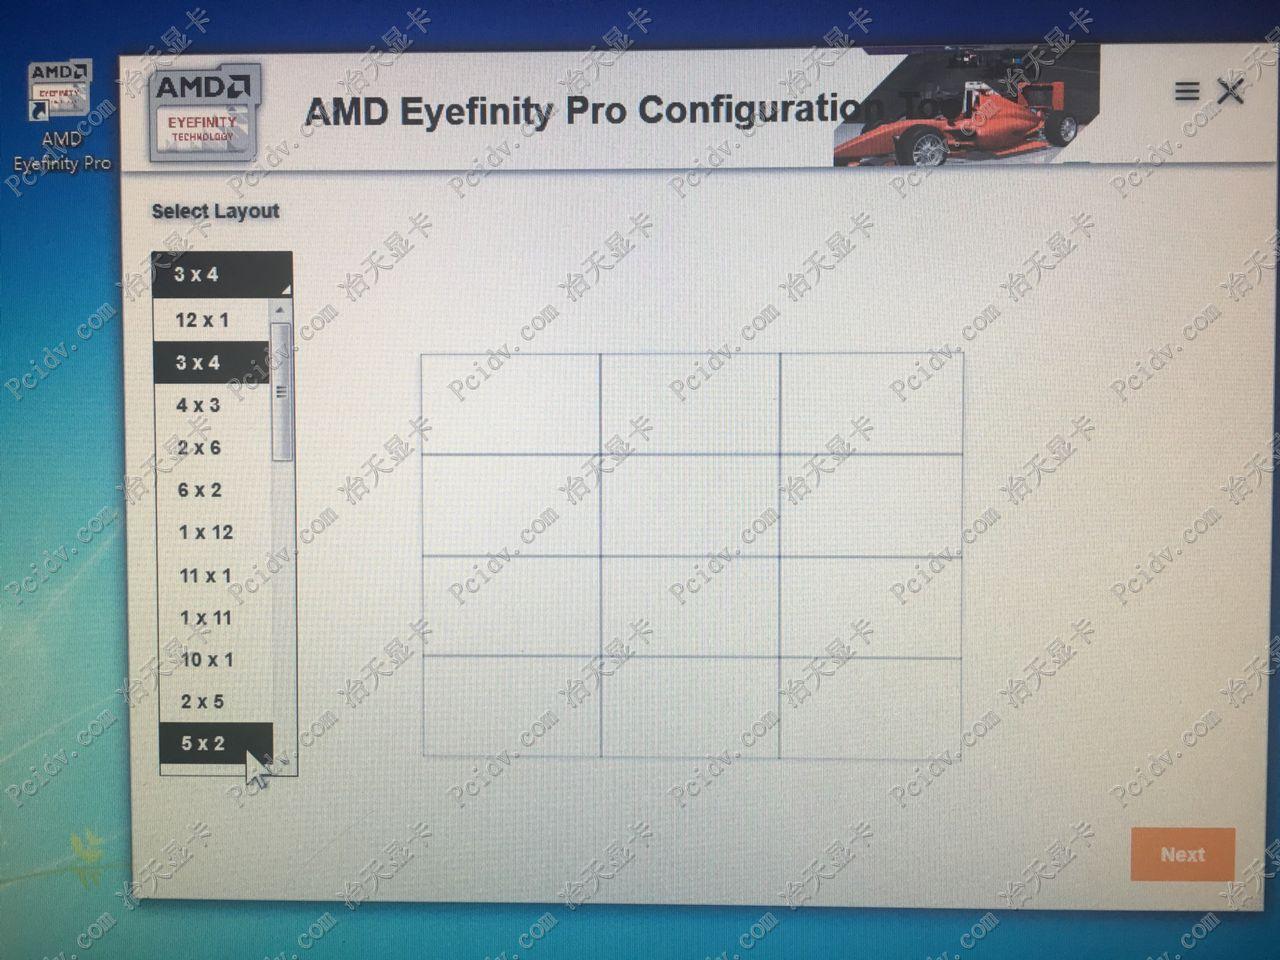 pcidv.com/firepro多屏显卡eyefinityPro跨卡拼接电视墙多卡级联跨屏点对点显示